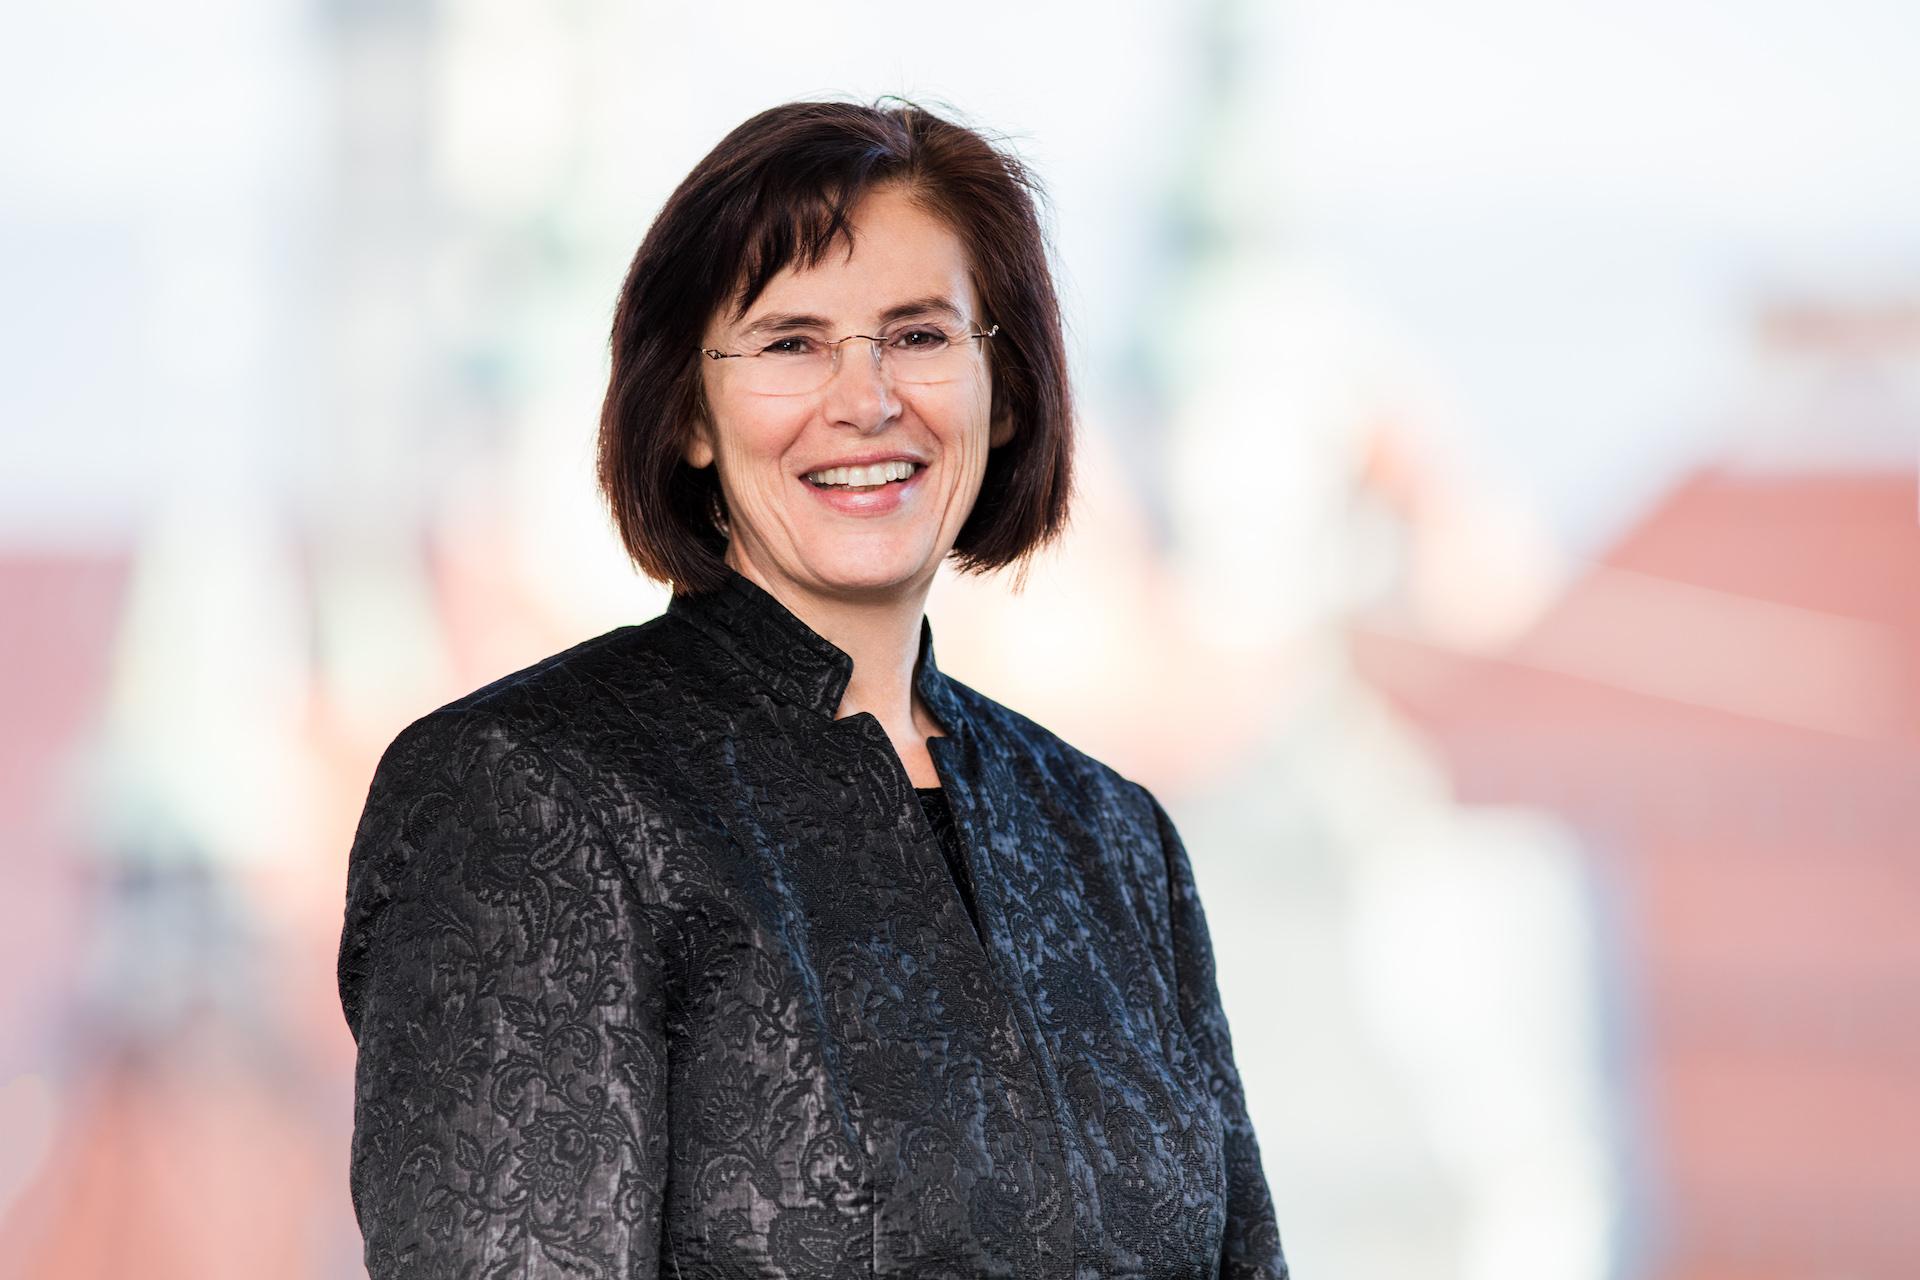 Martina Tautschnig